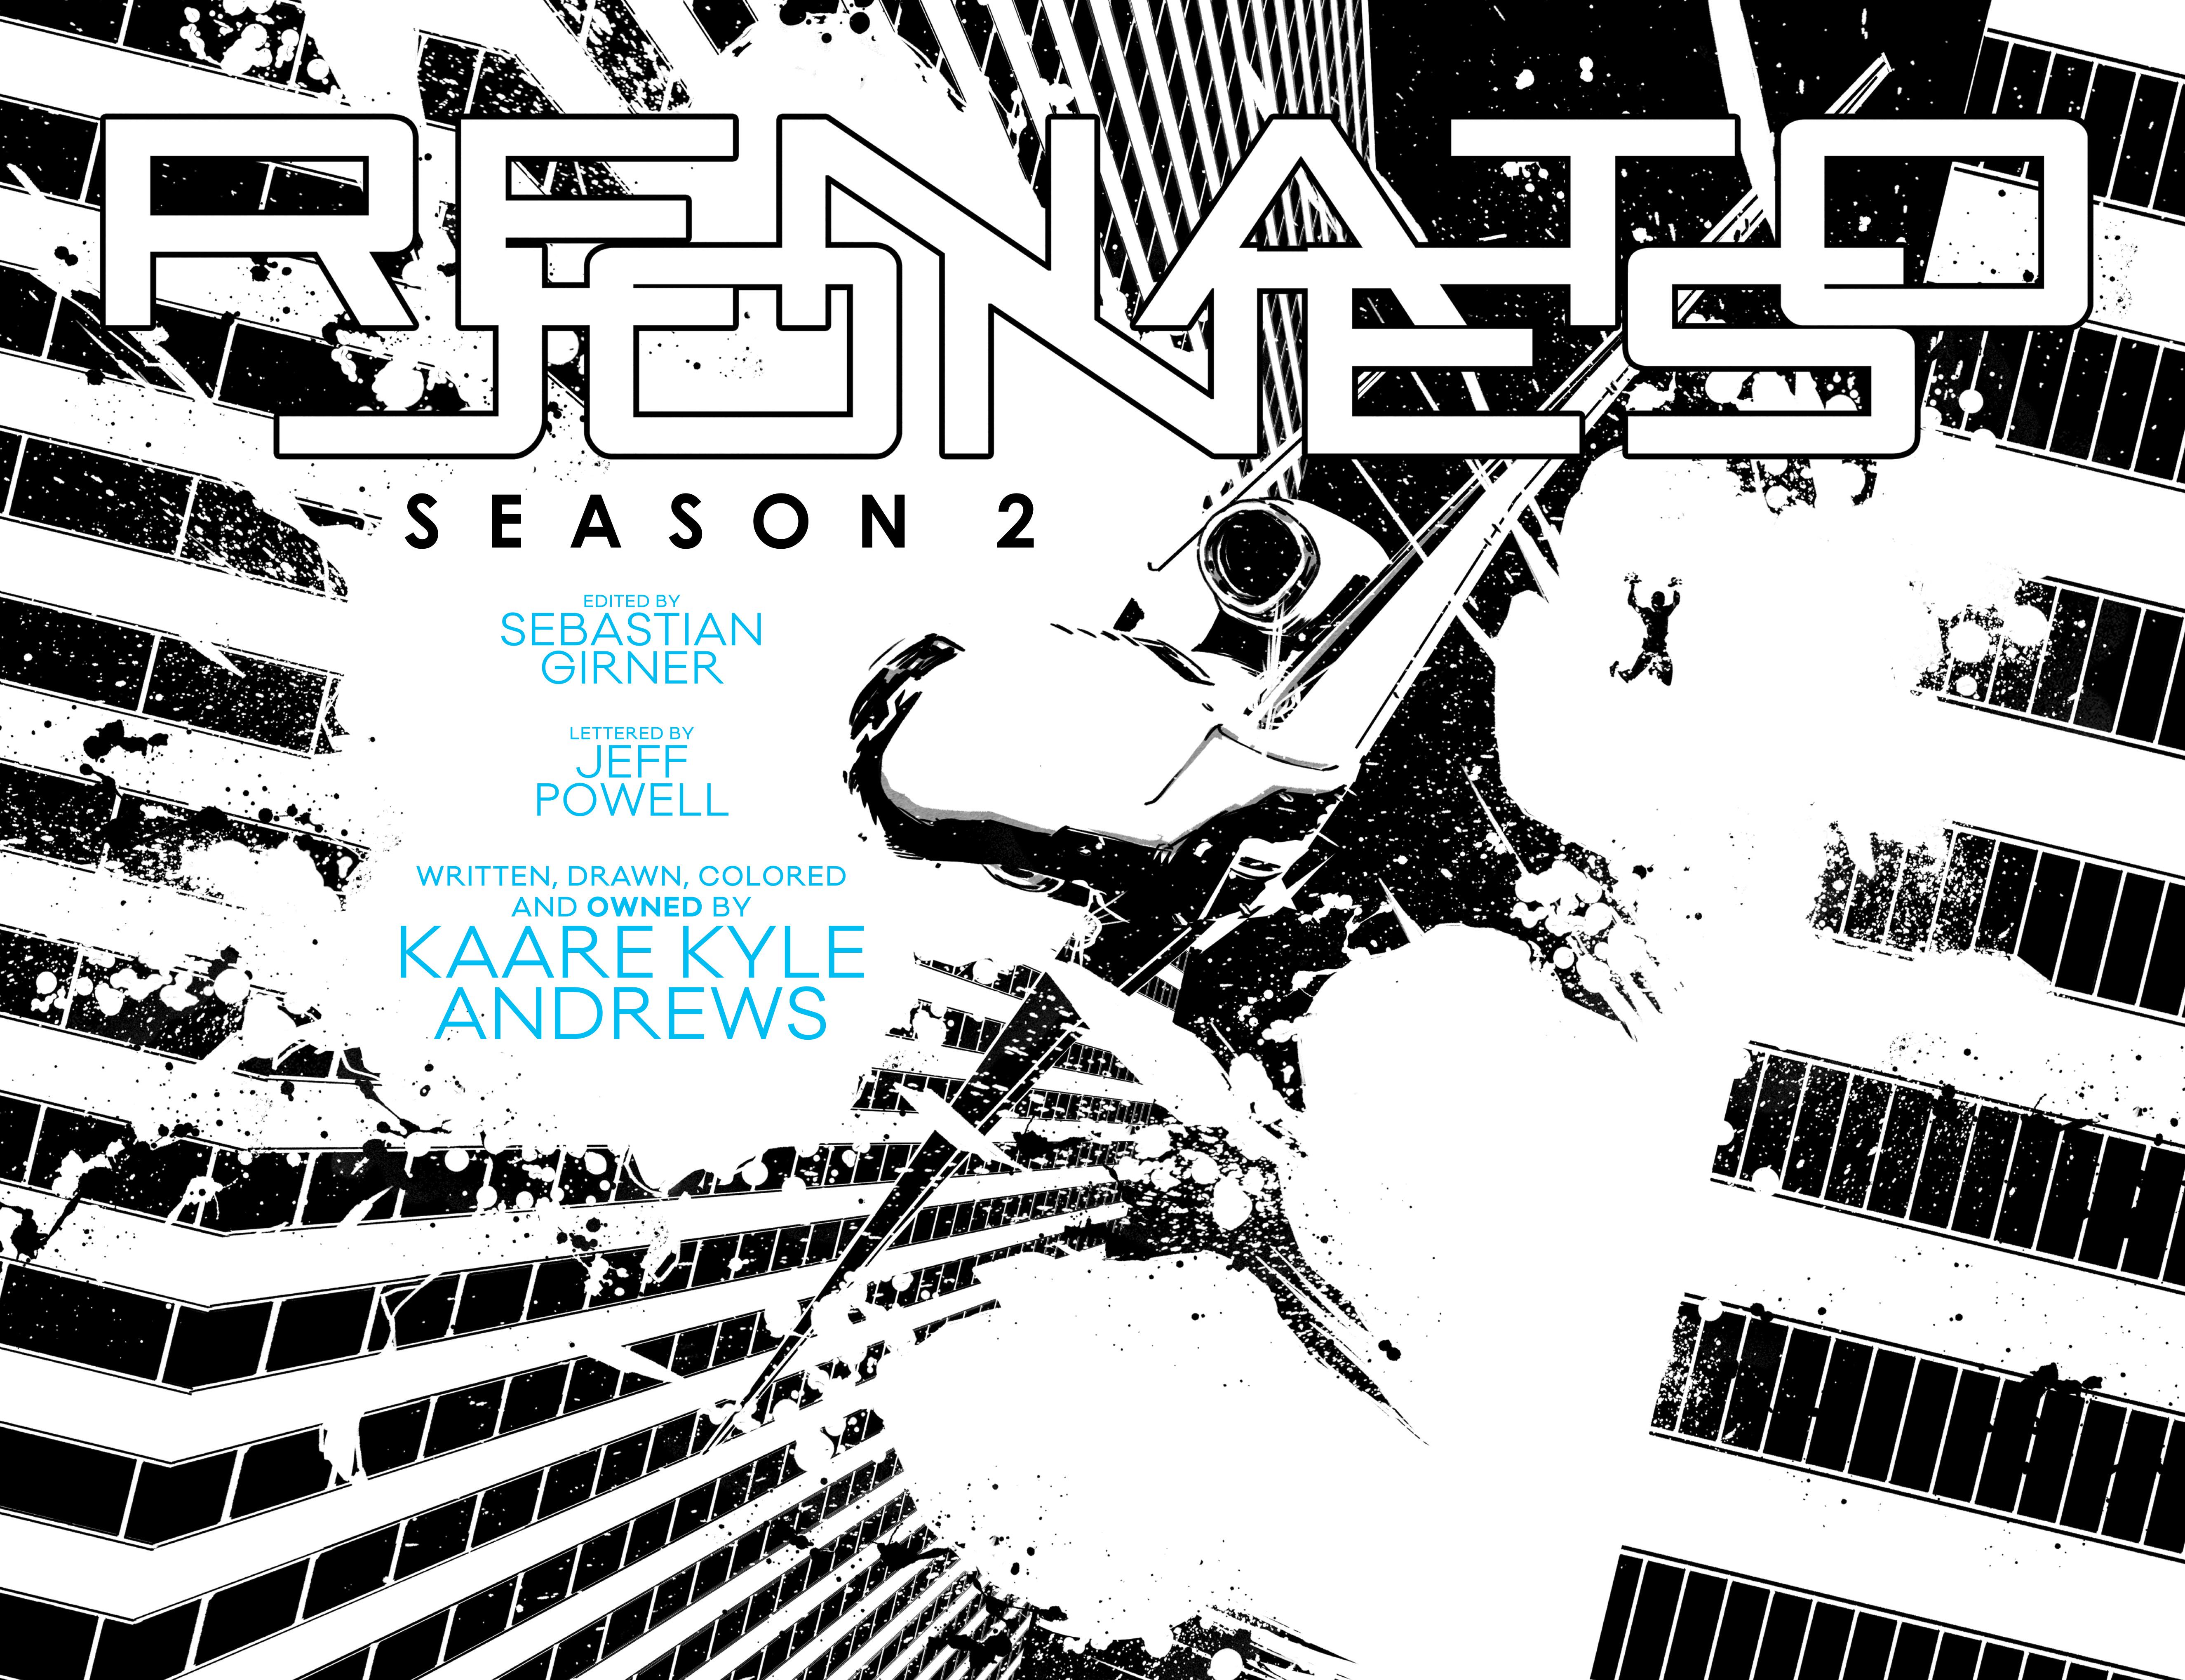 Read online Renato Jones, Season 2: Freelancer comic -  Issue #1 - 13